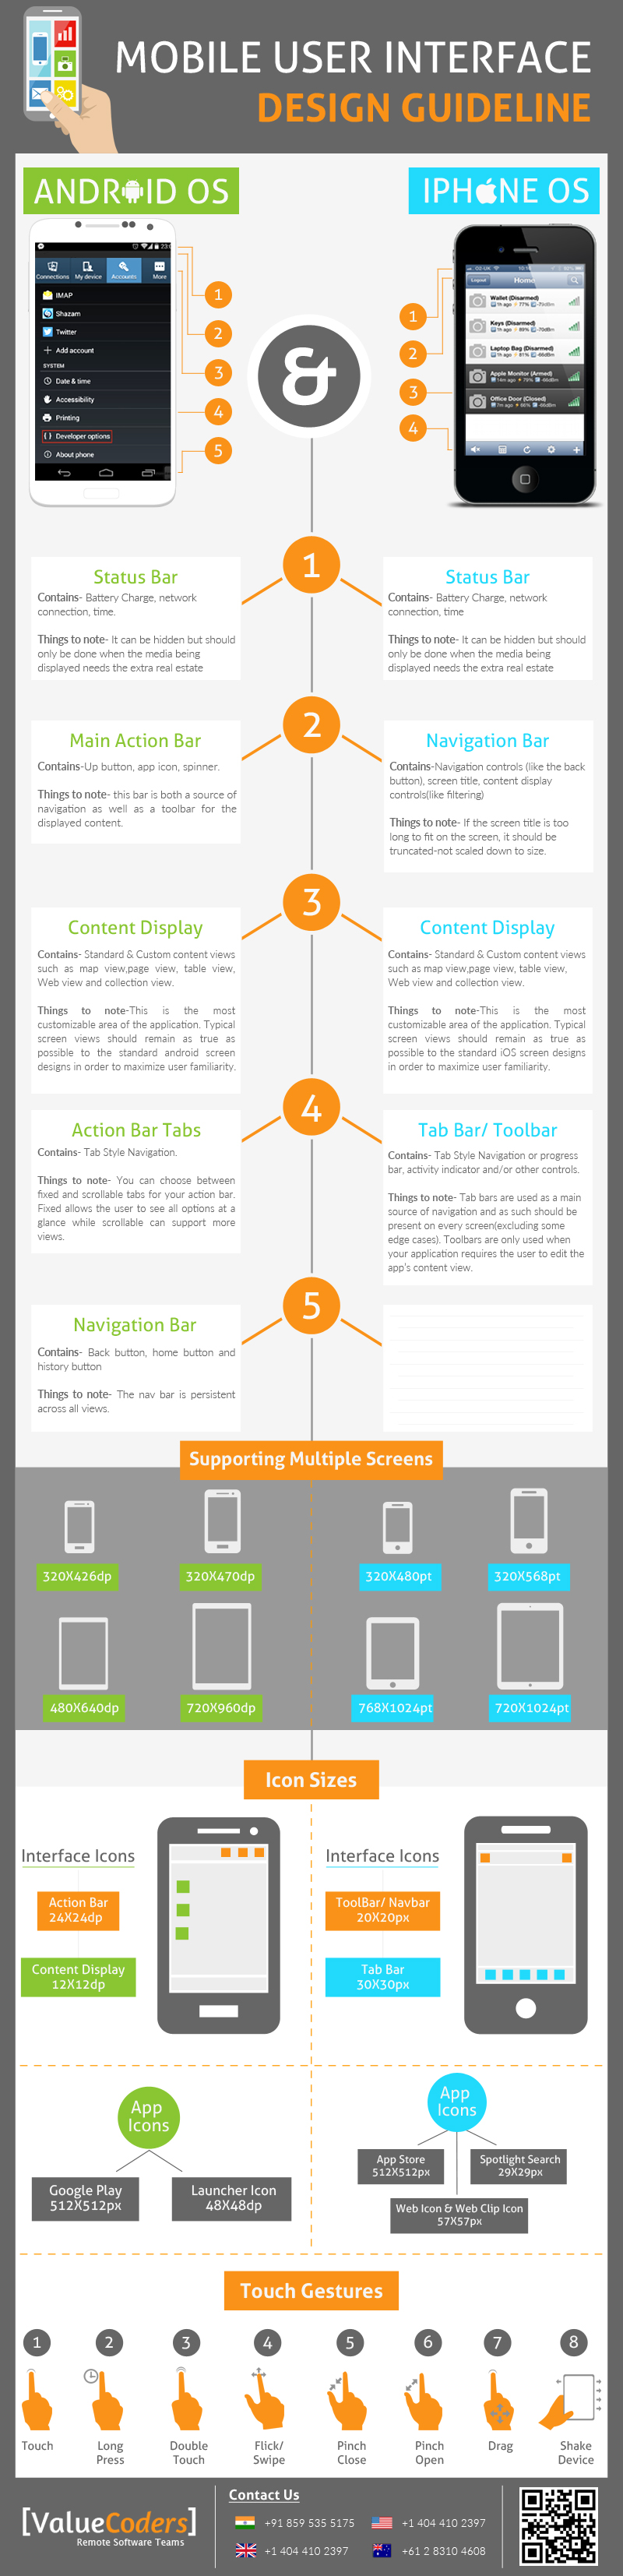 Mobile User Interface - Design Guideline